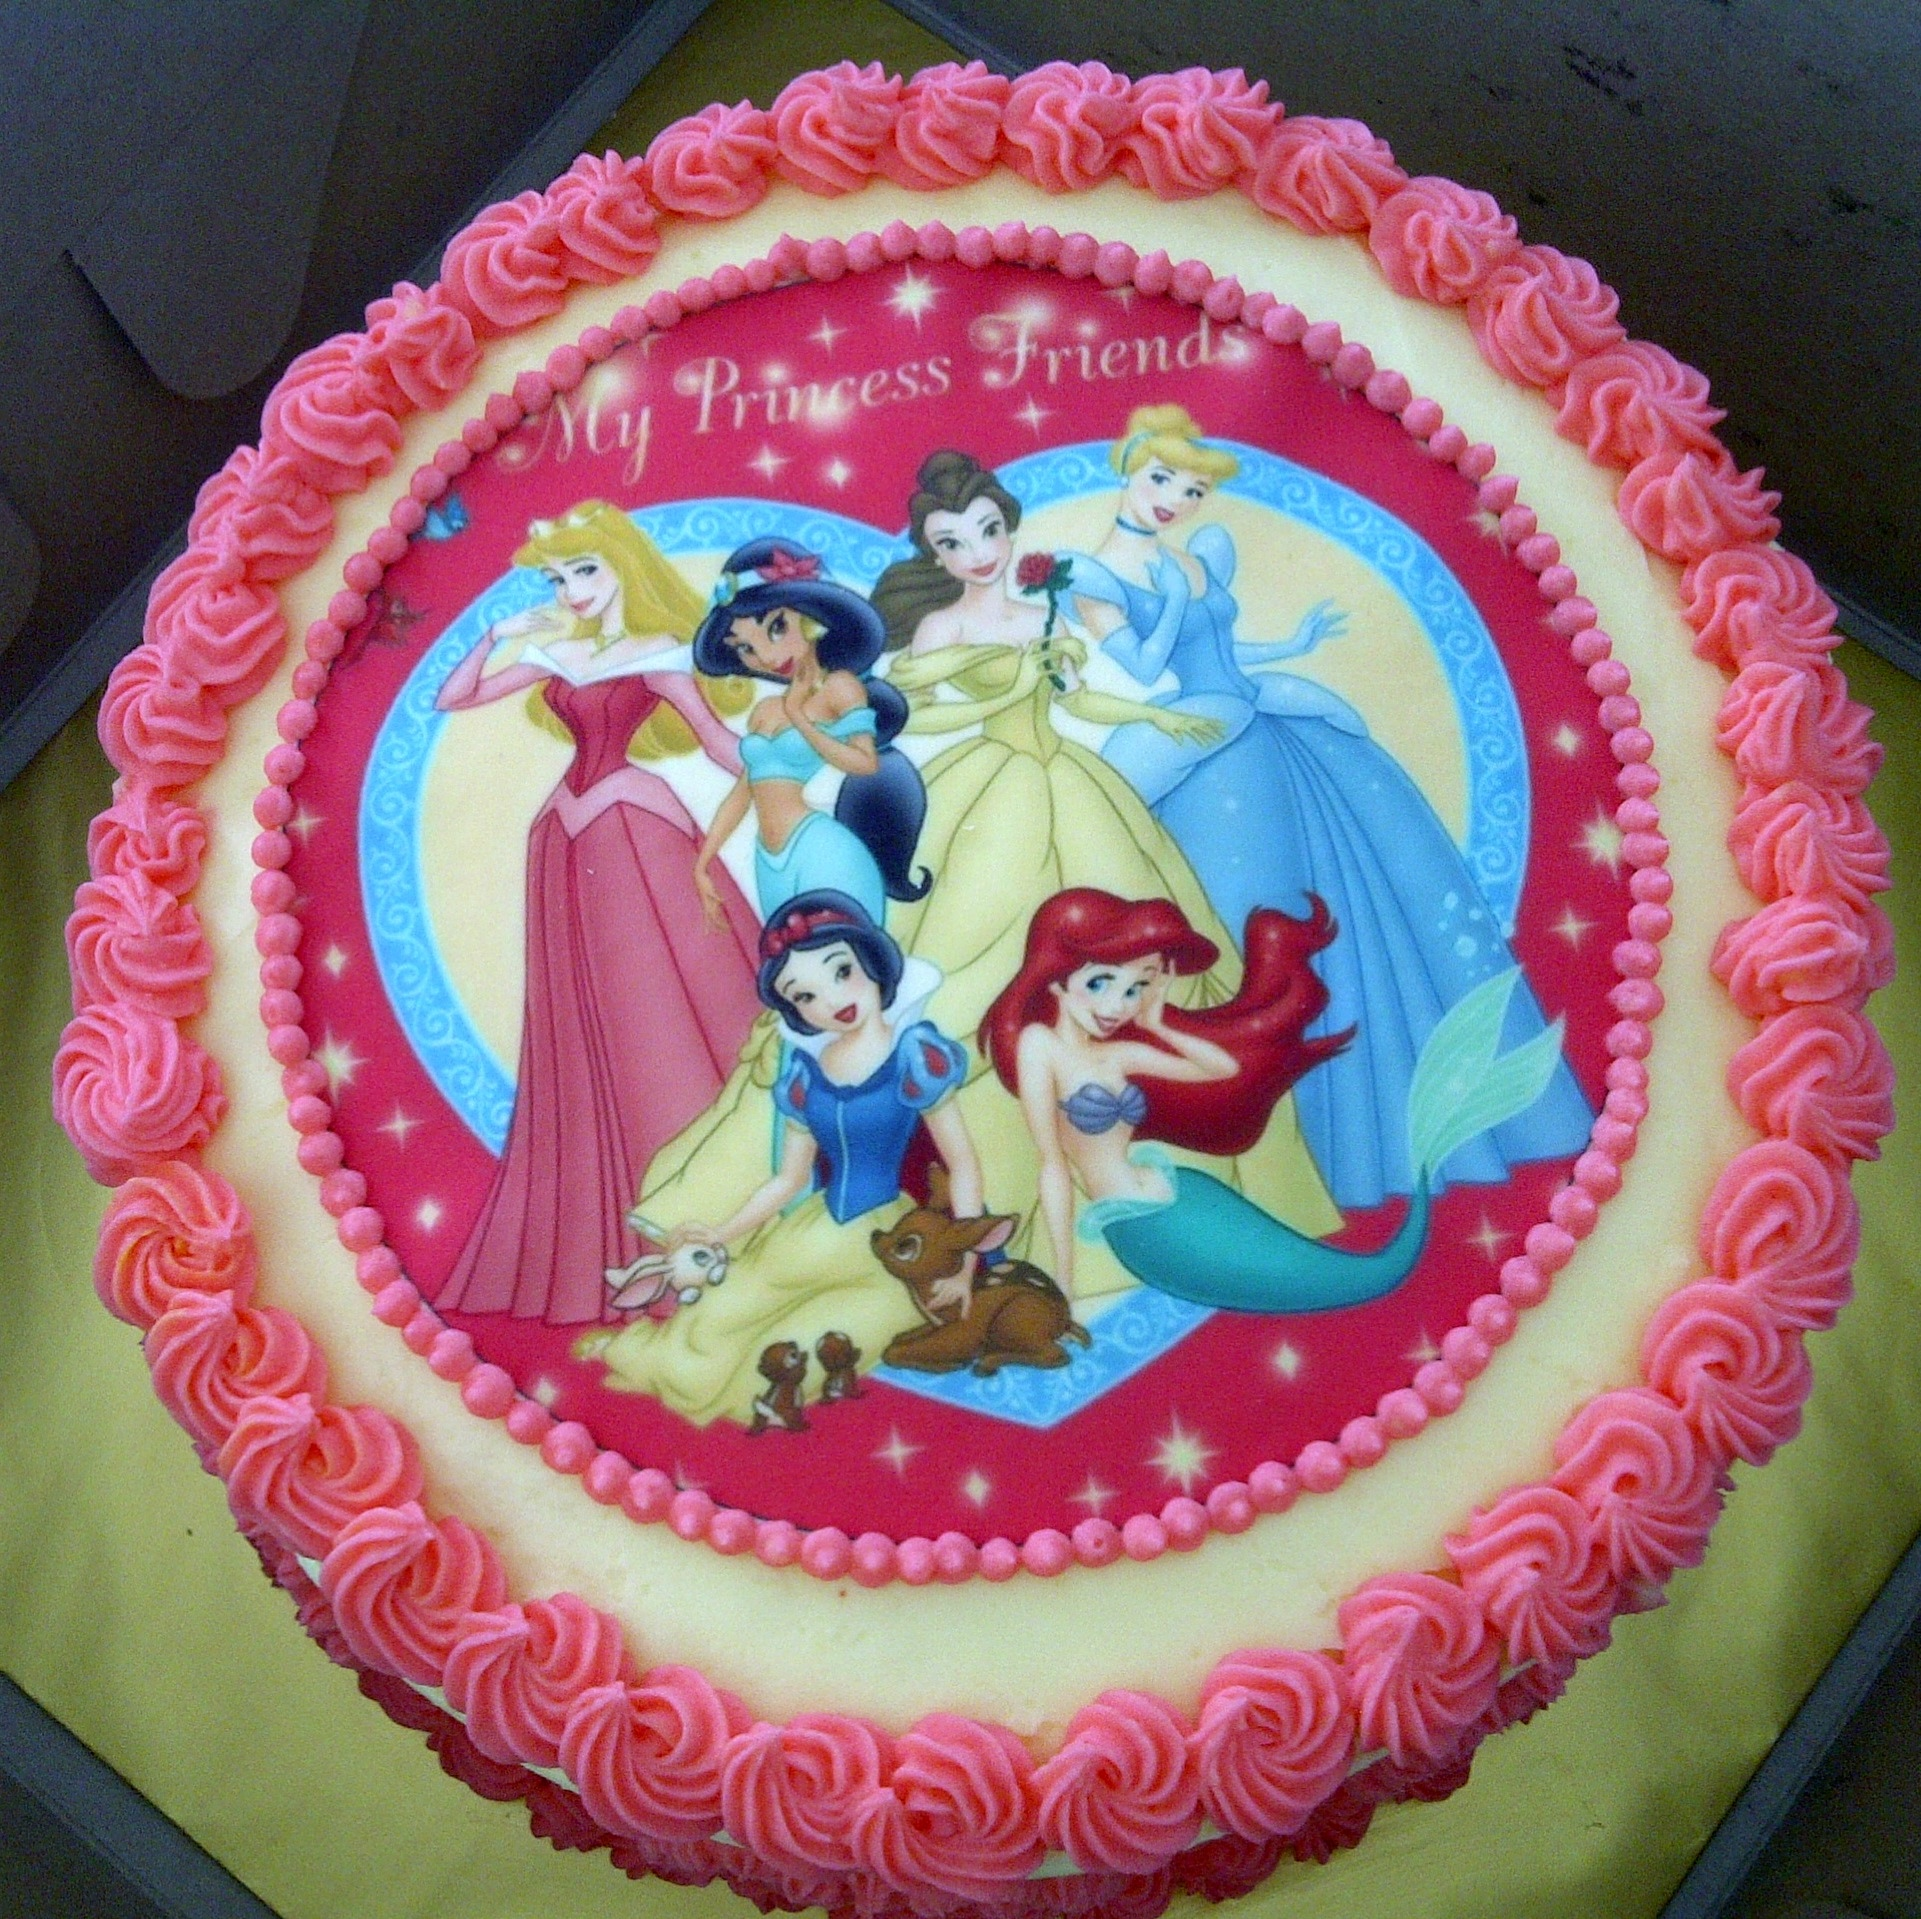 Vintage Rainbow Cake Decoration Edible : edible image: boboiboy